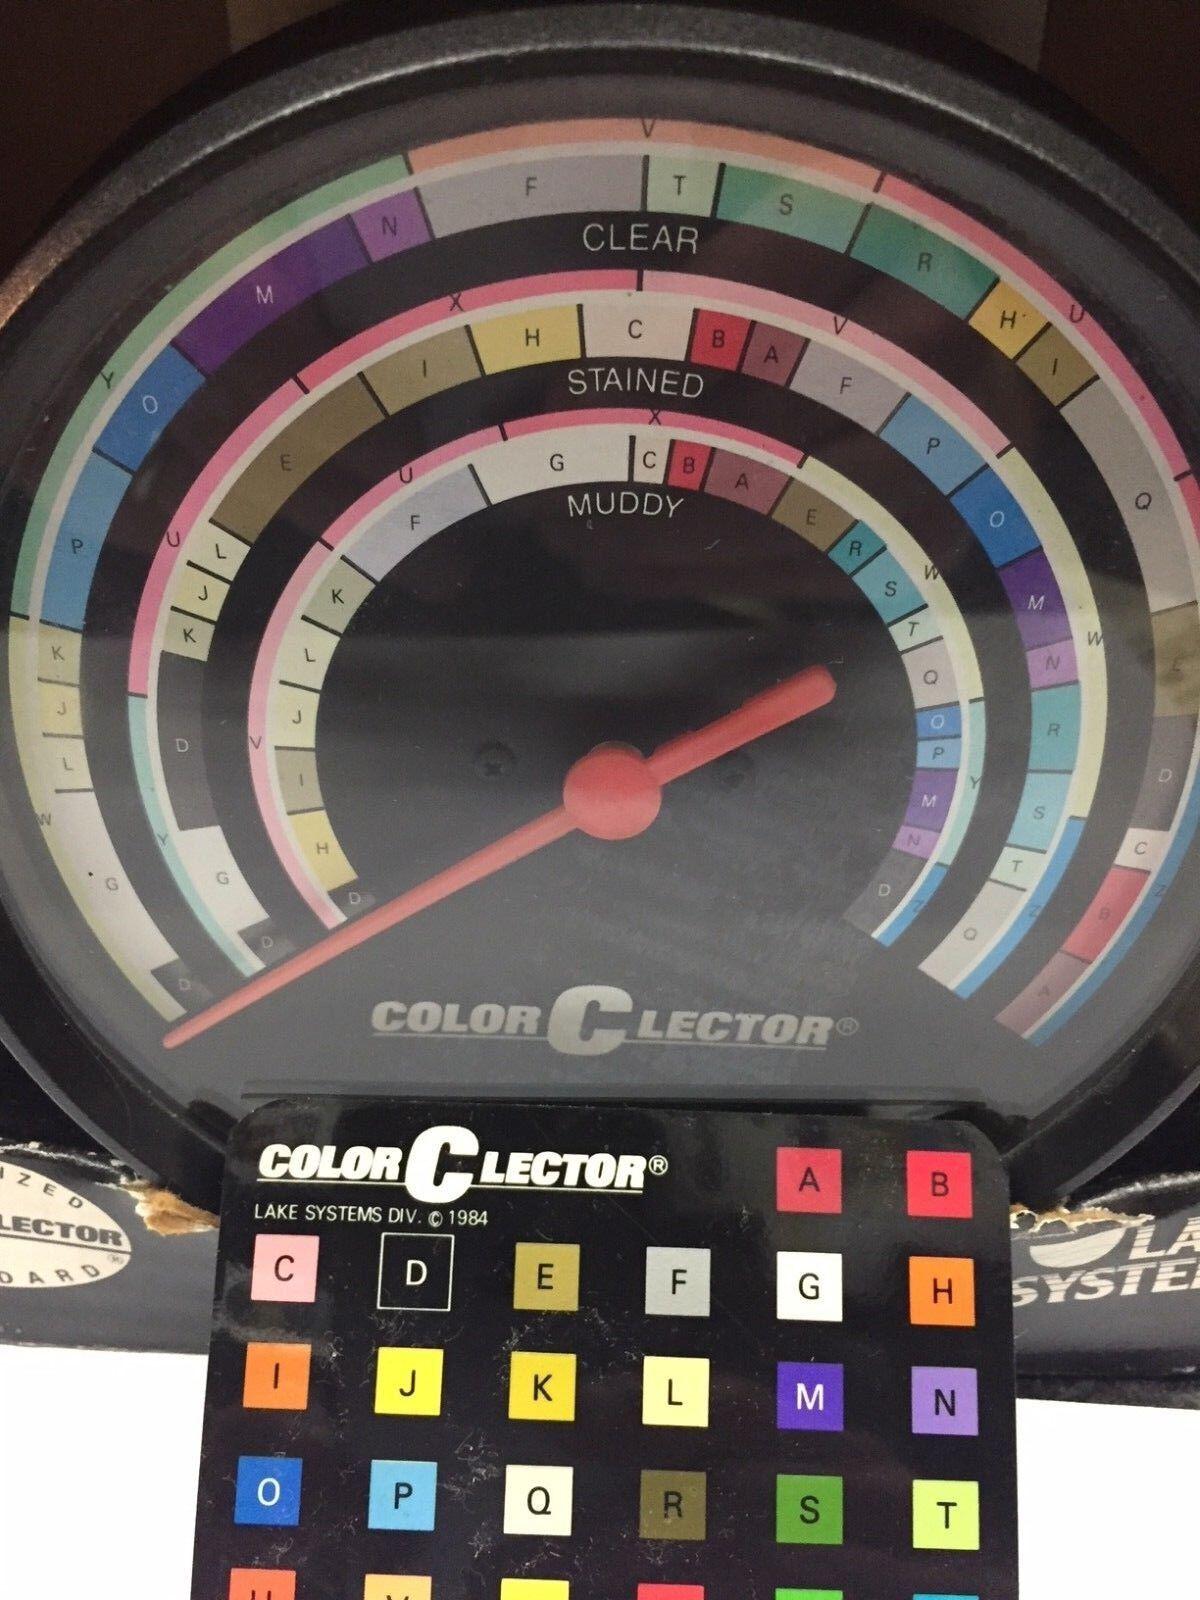 Colore-C-Lector Vintage Colore Lure Selector  Coloreclector Selettore colore esche